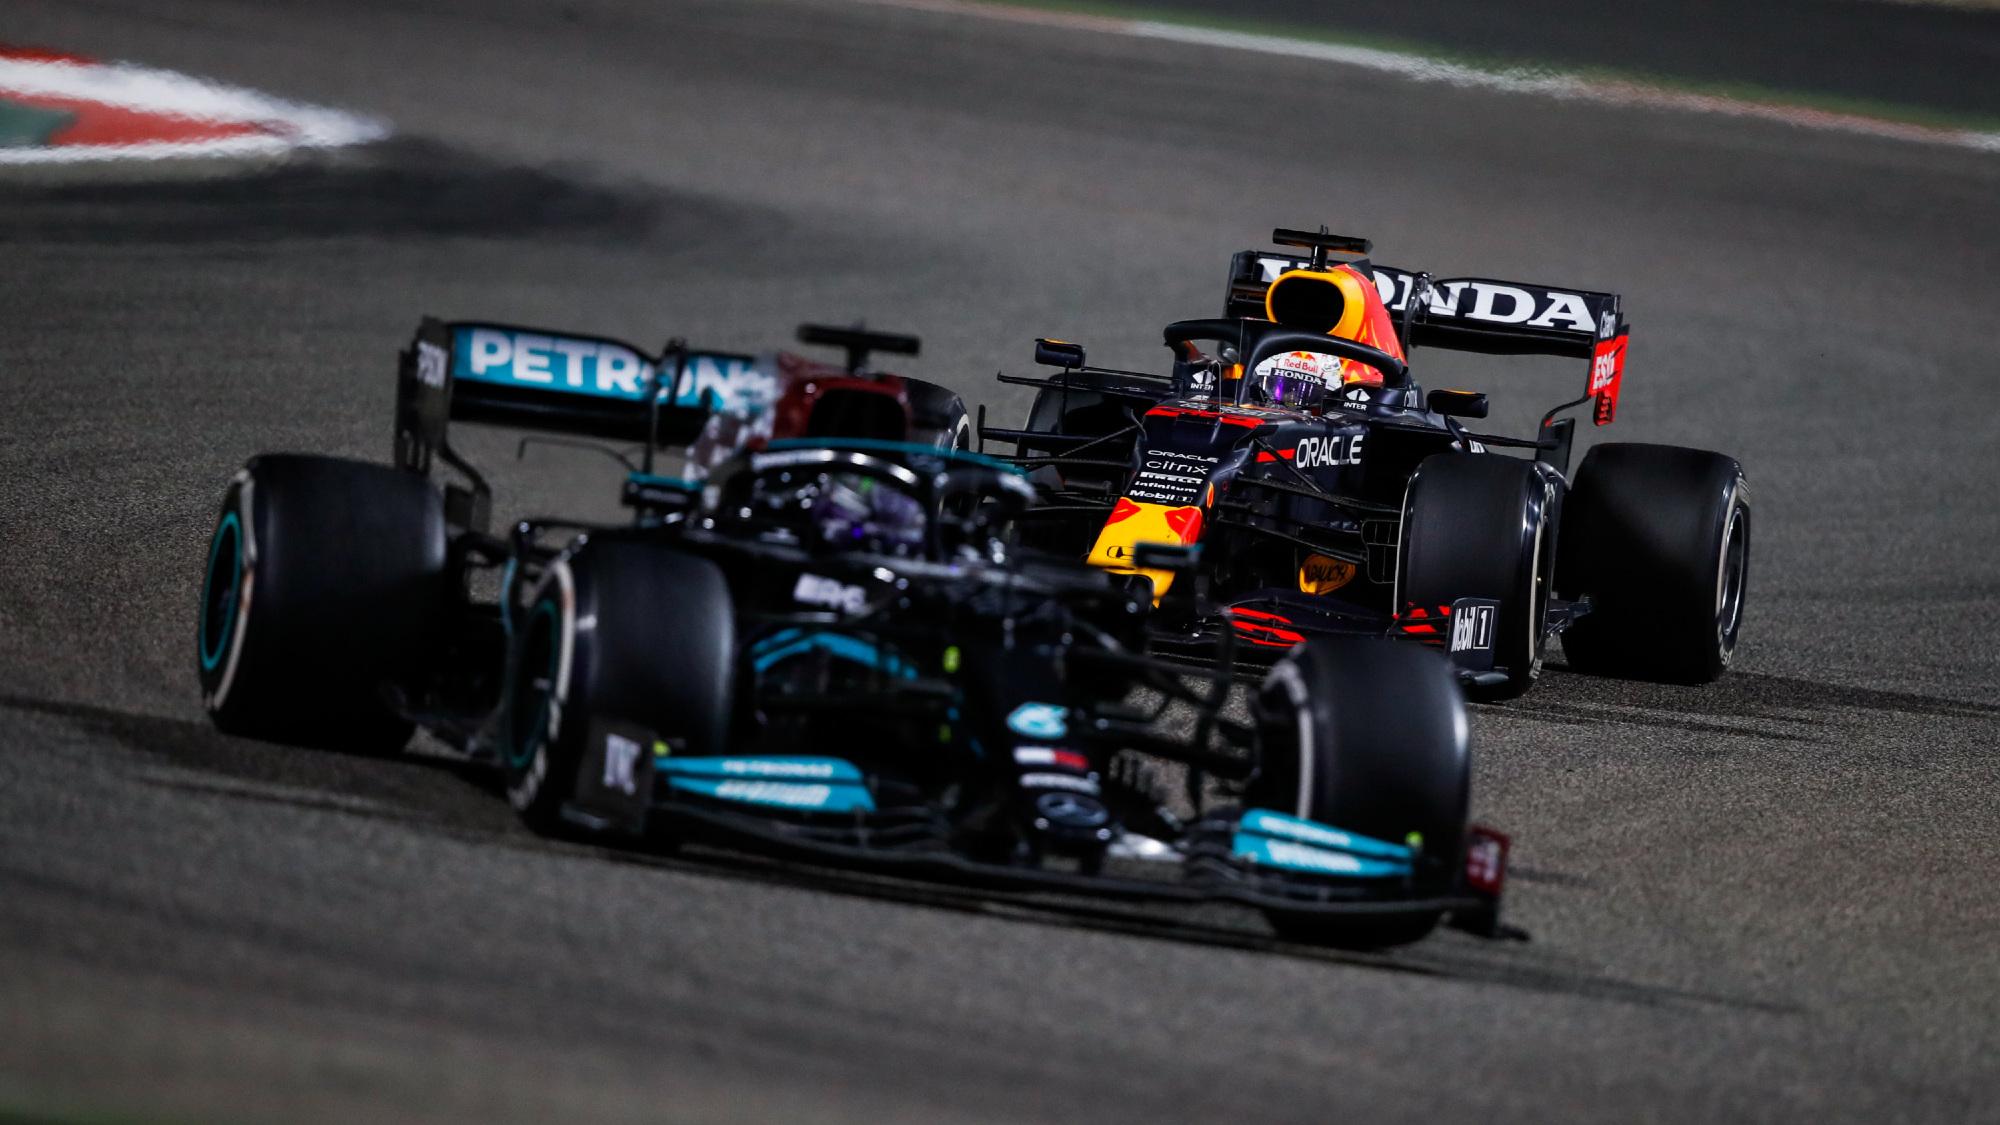 Lewis Hamilton, Max Verstappen 2021 Bahrain GP